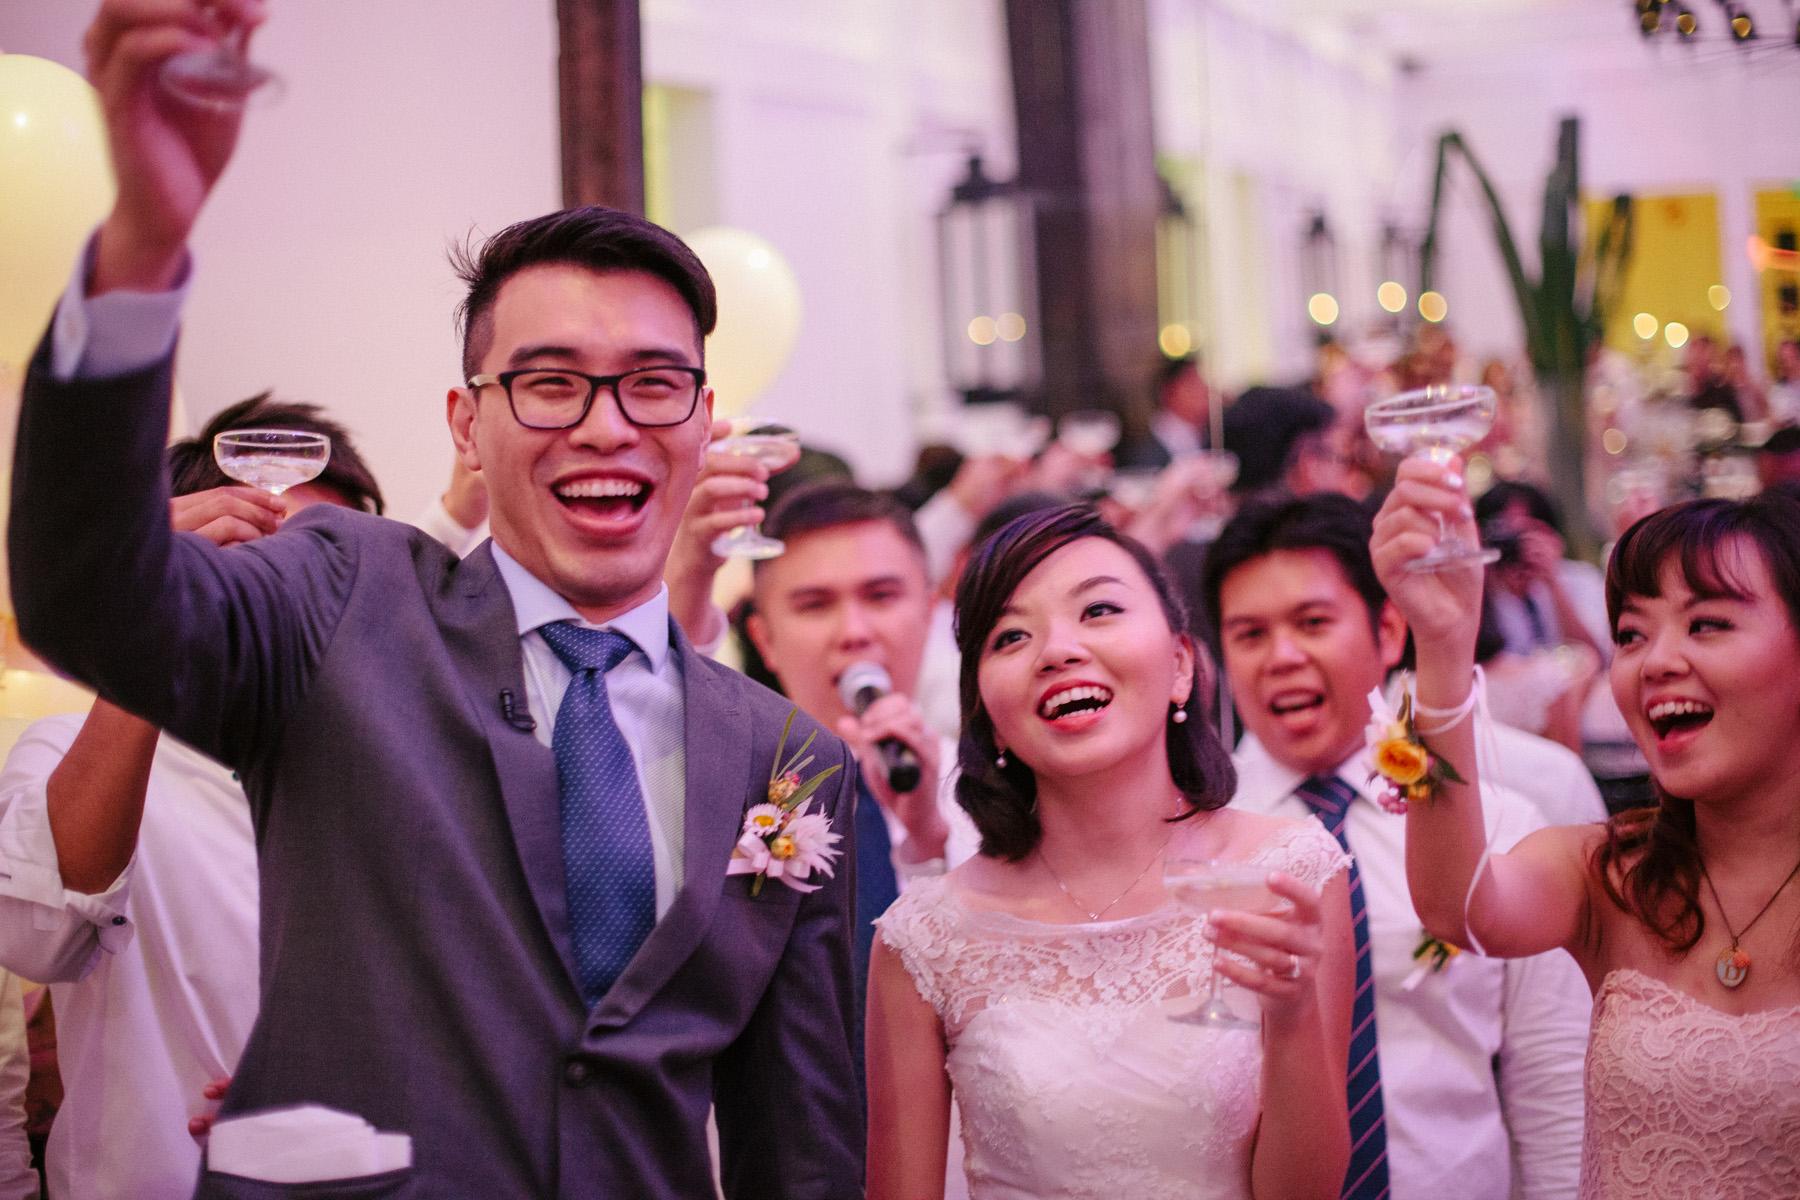 singapore-wedding-travel-photographer-faith-alvin-wedding-wmt-47.jpg